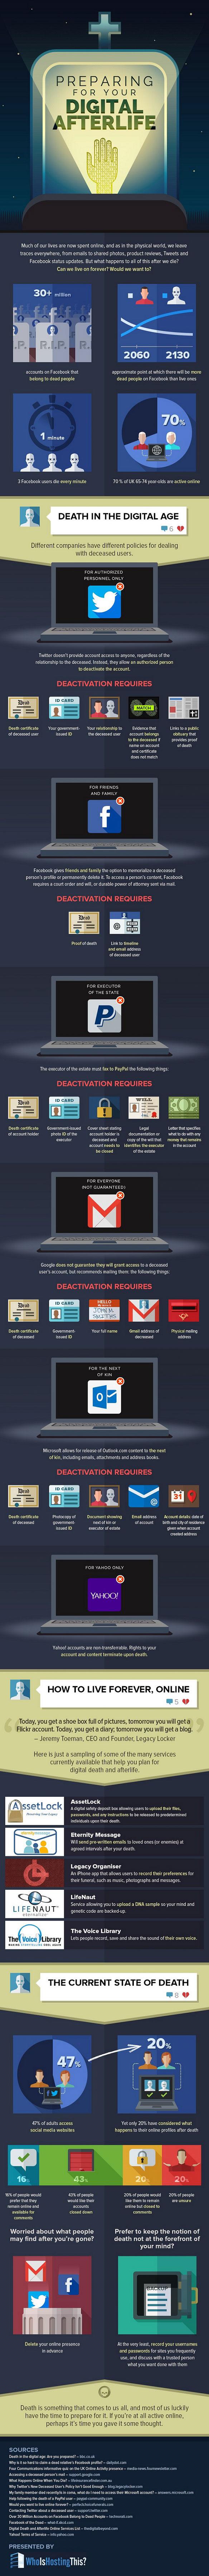 Digital Immortality-Infographic